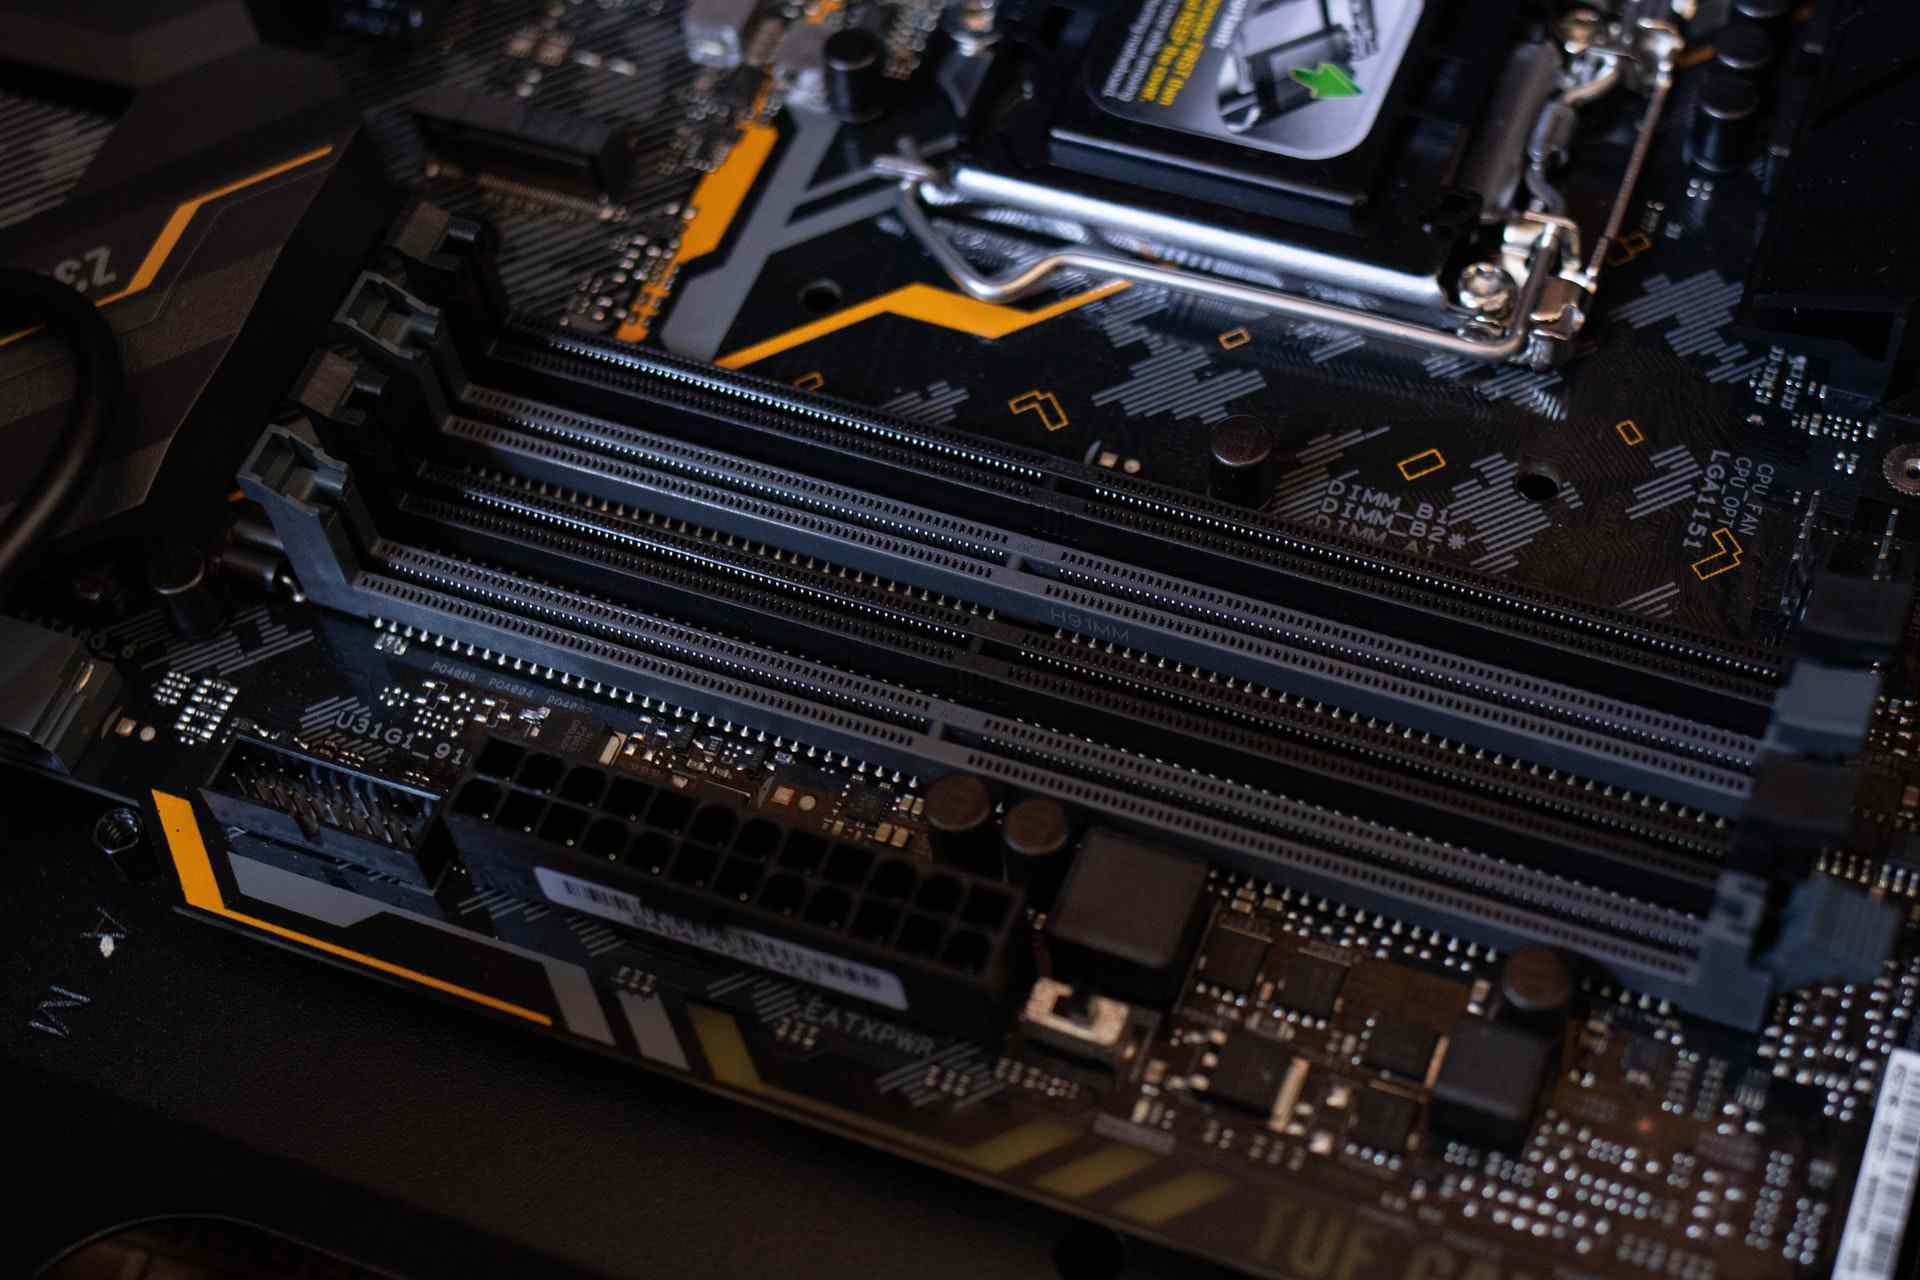 Motherboard RAM Slots empty